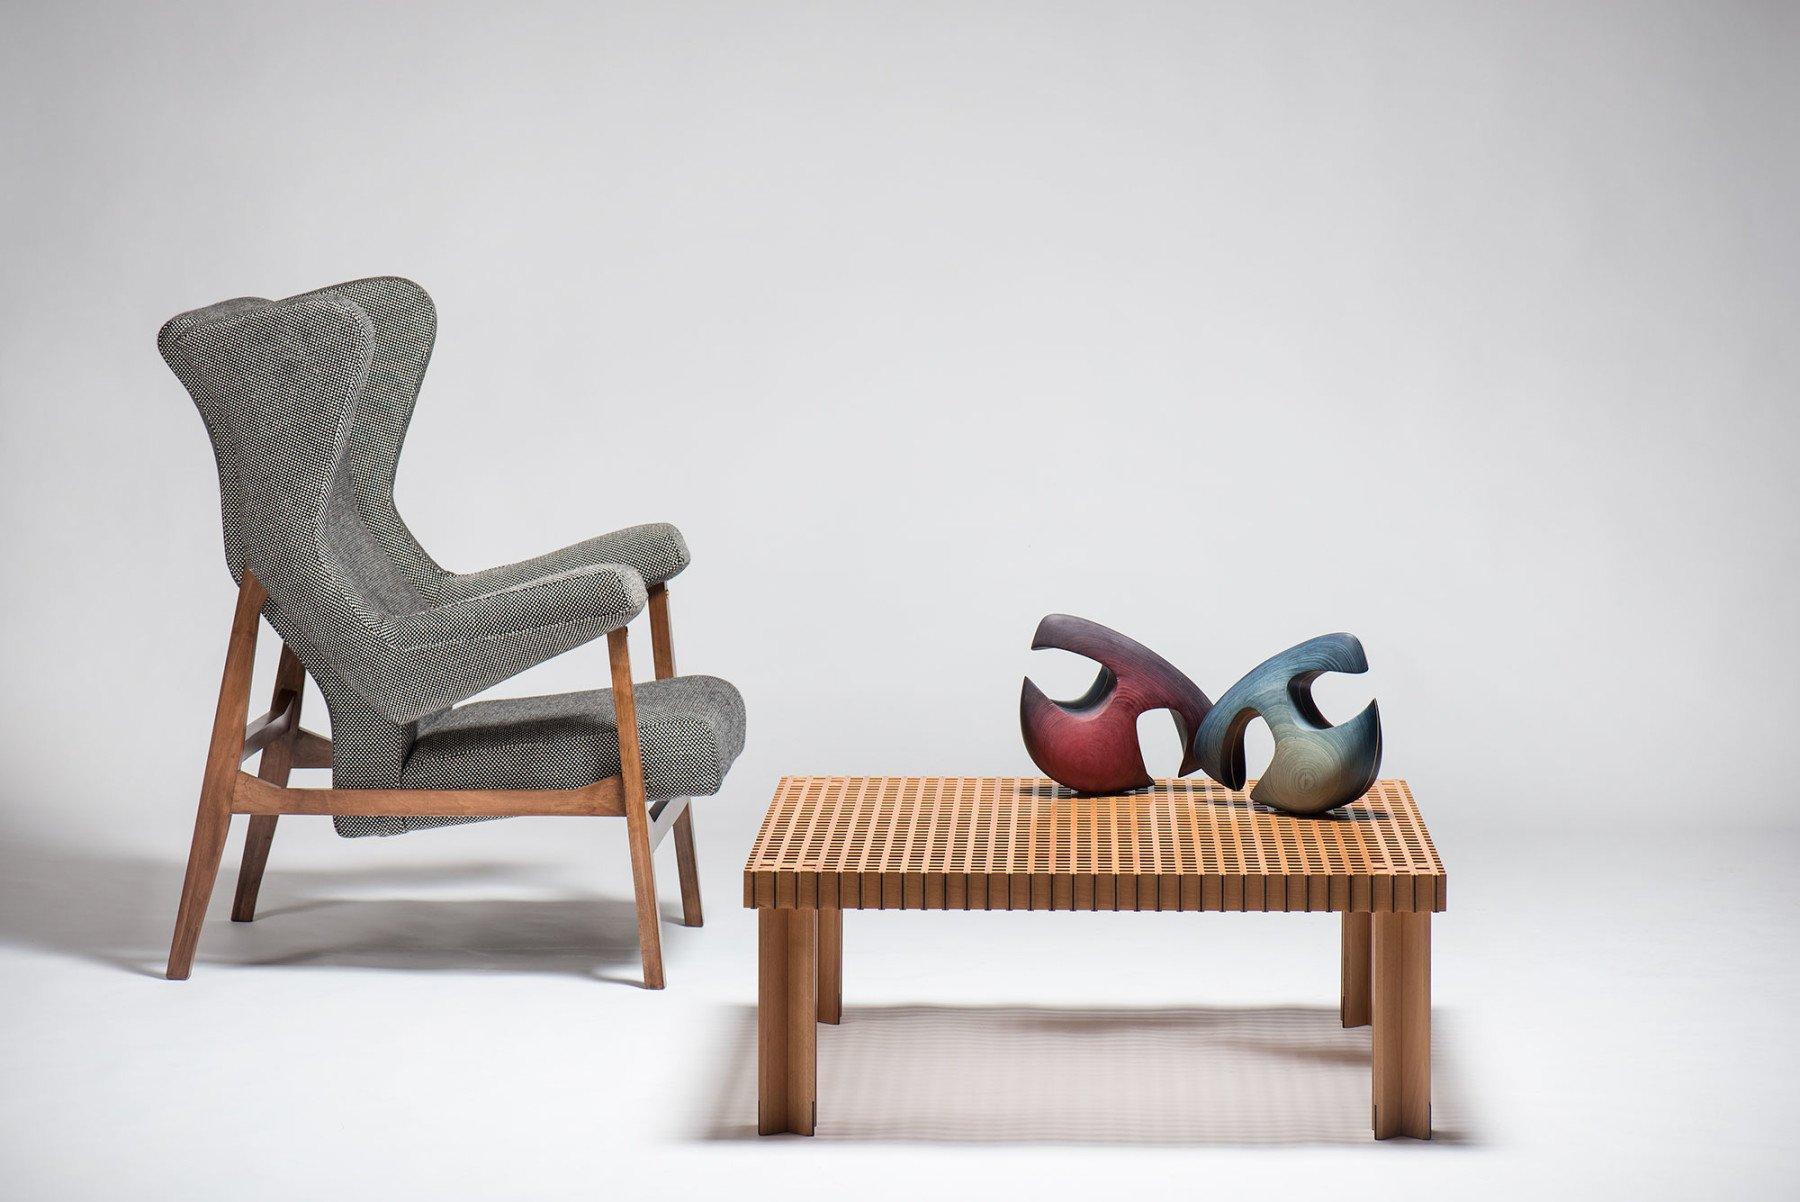 Franco Albini |  Fiorenza armchair